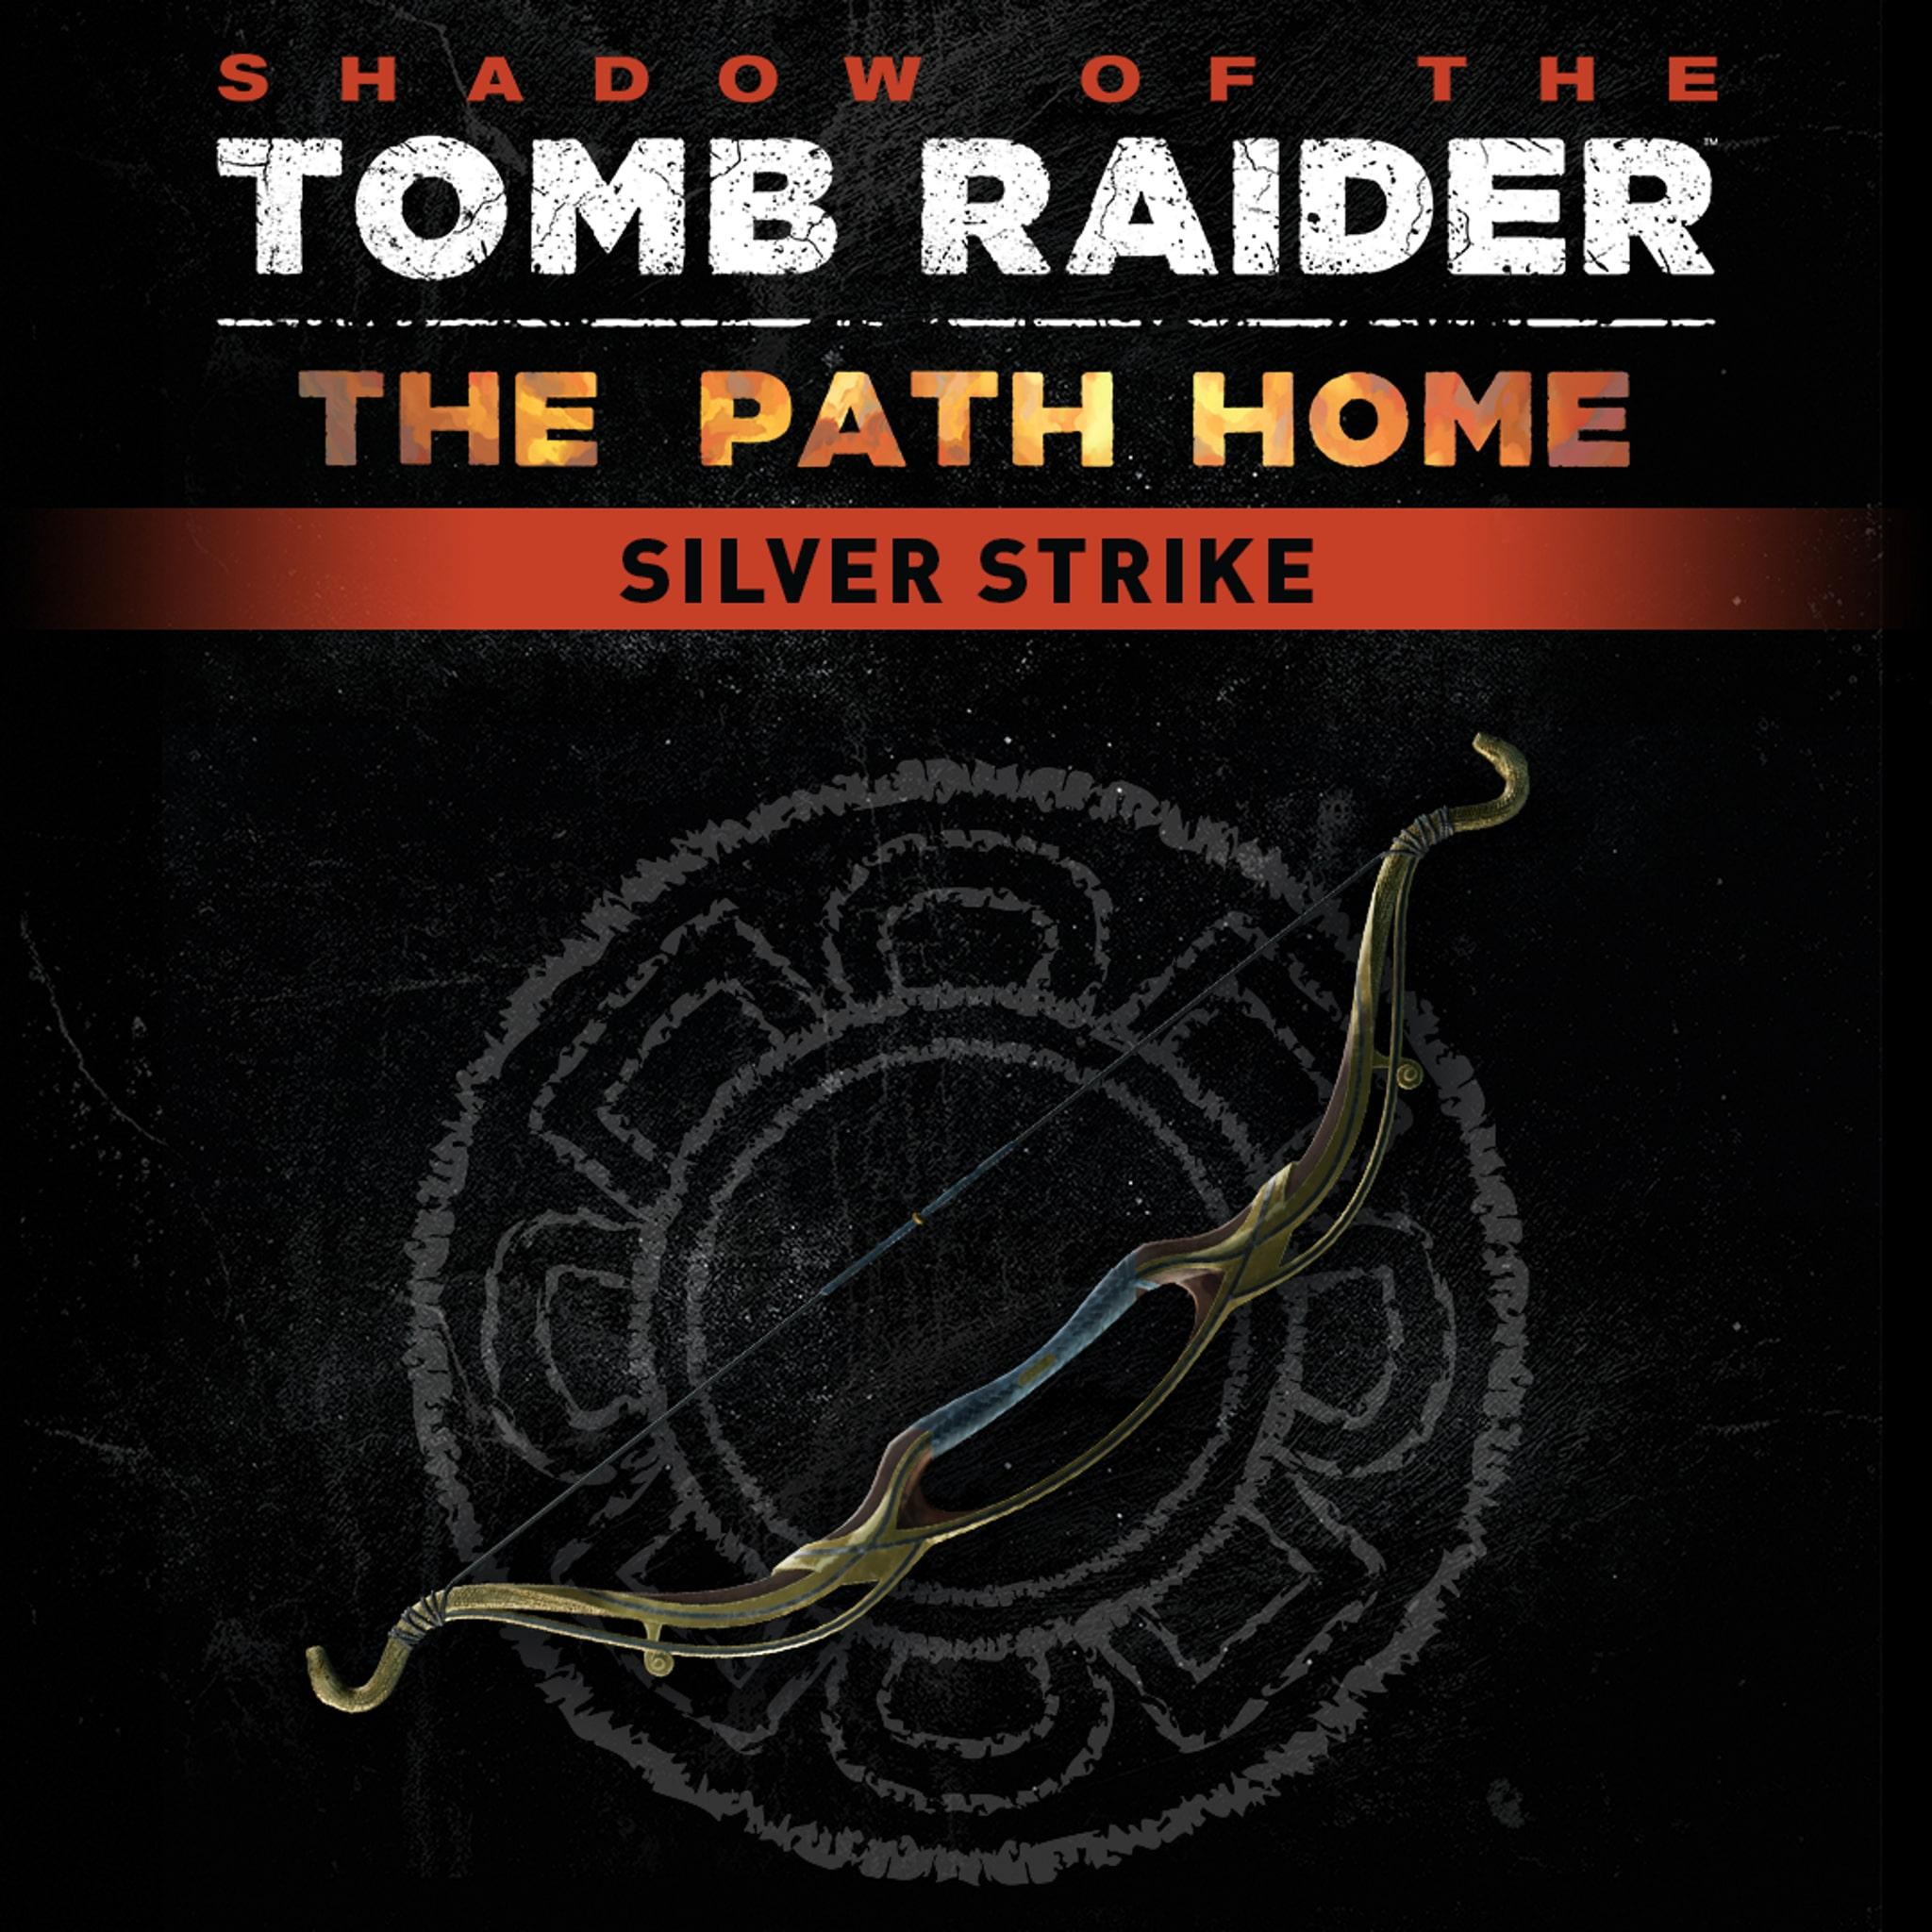 Shadow of the Tomb Raider - Silver Strike